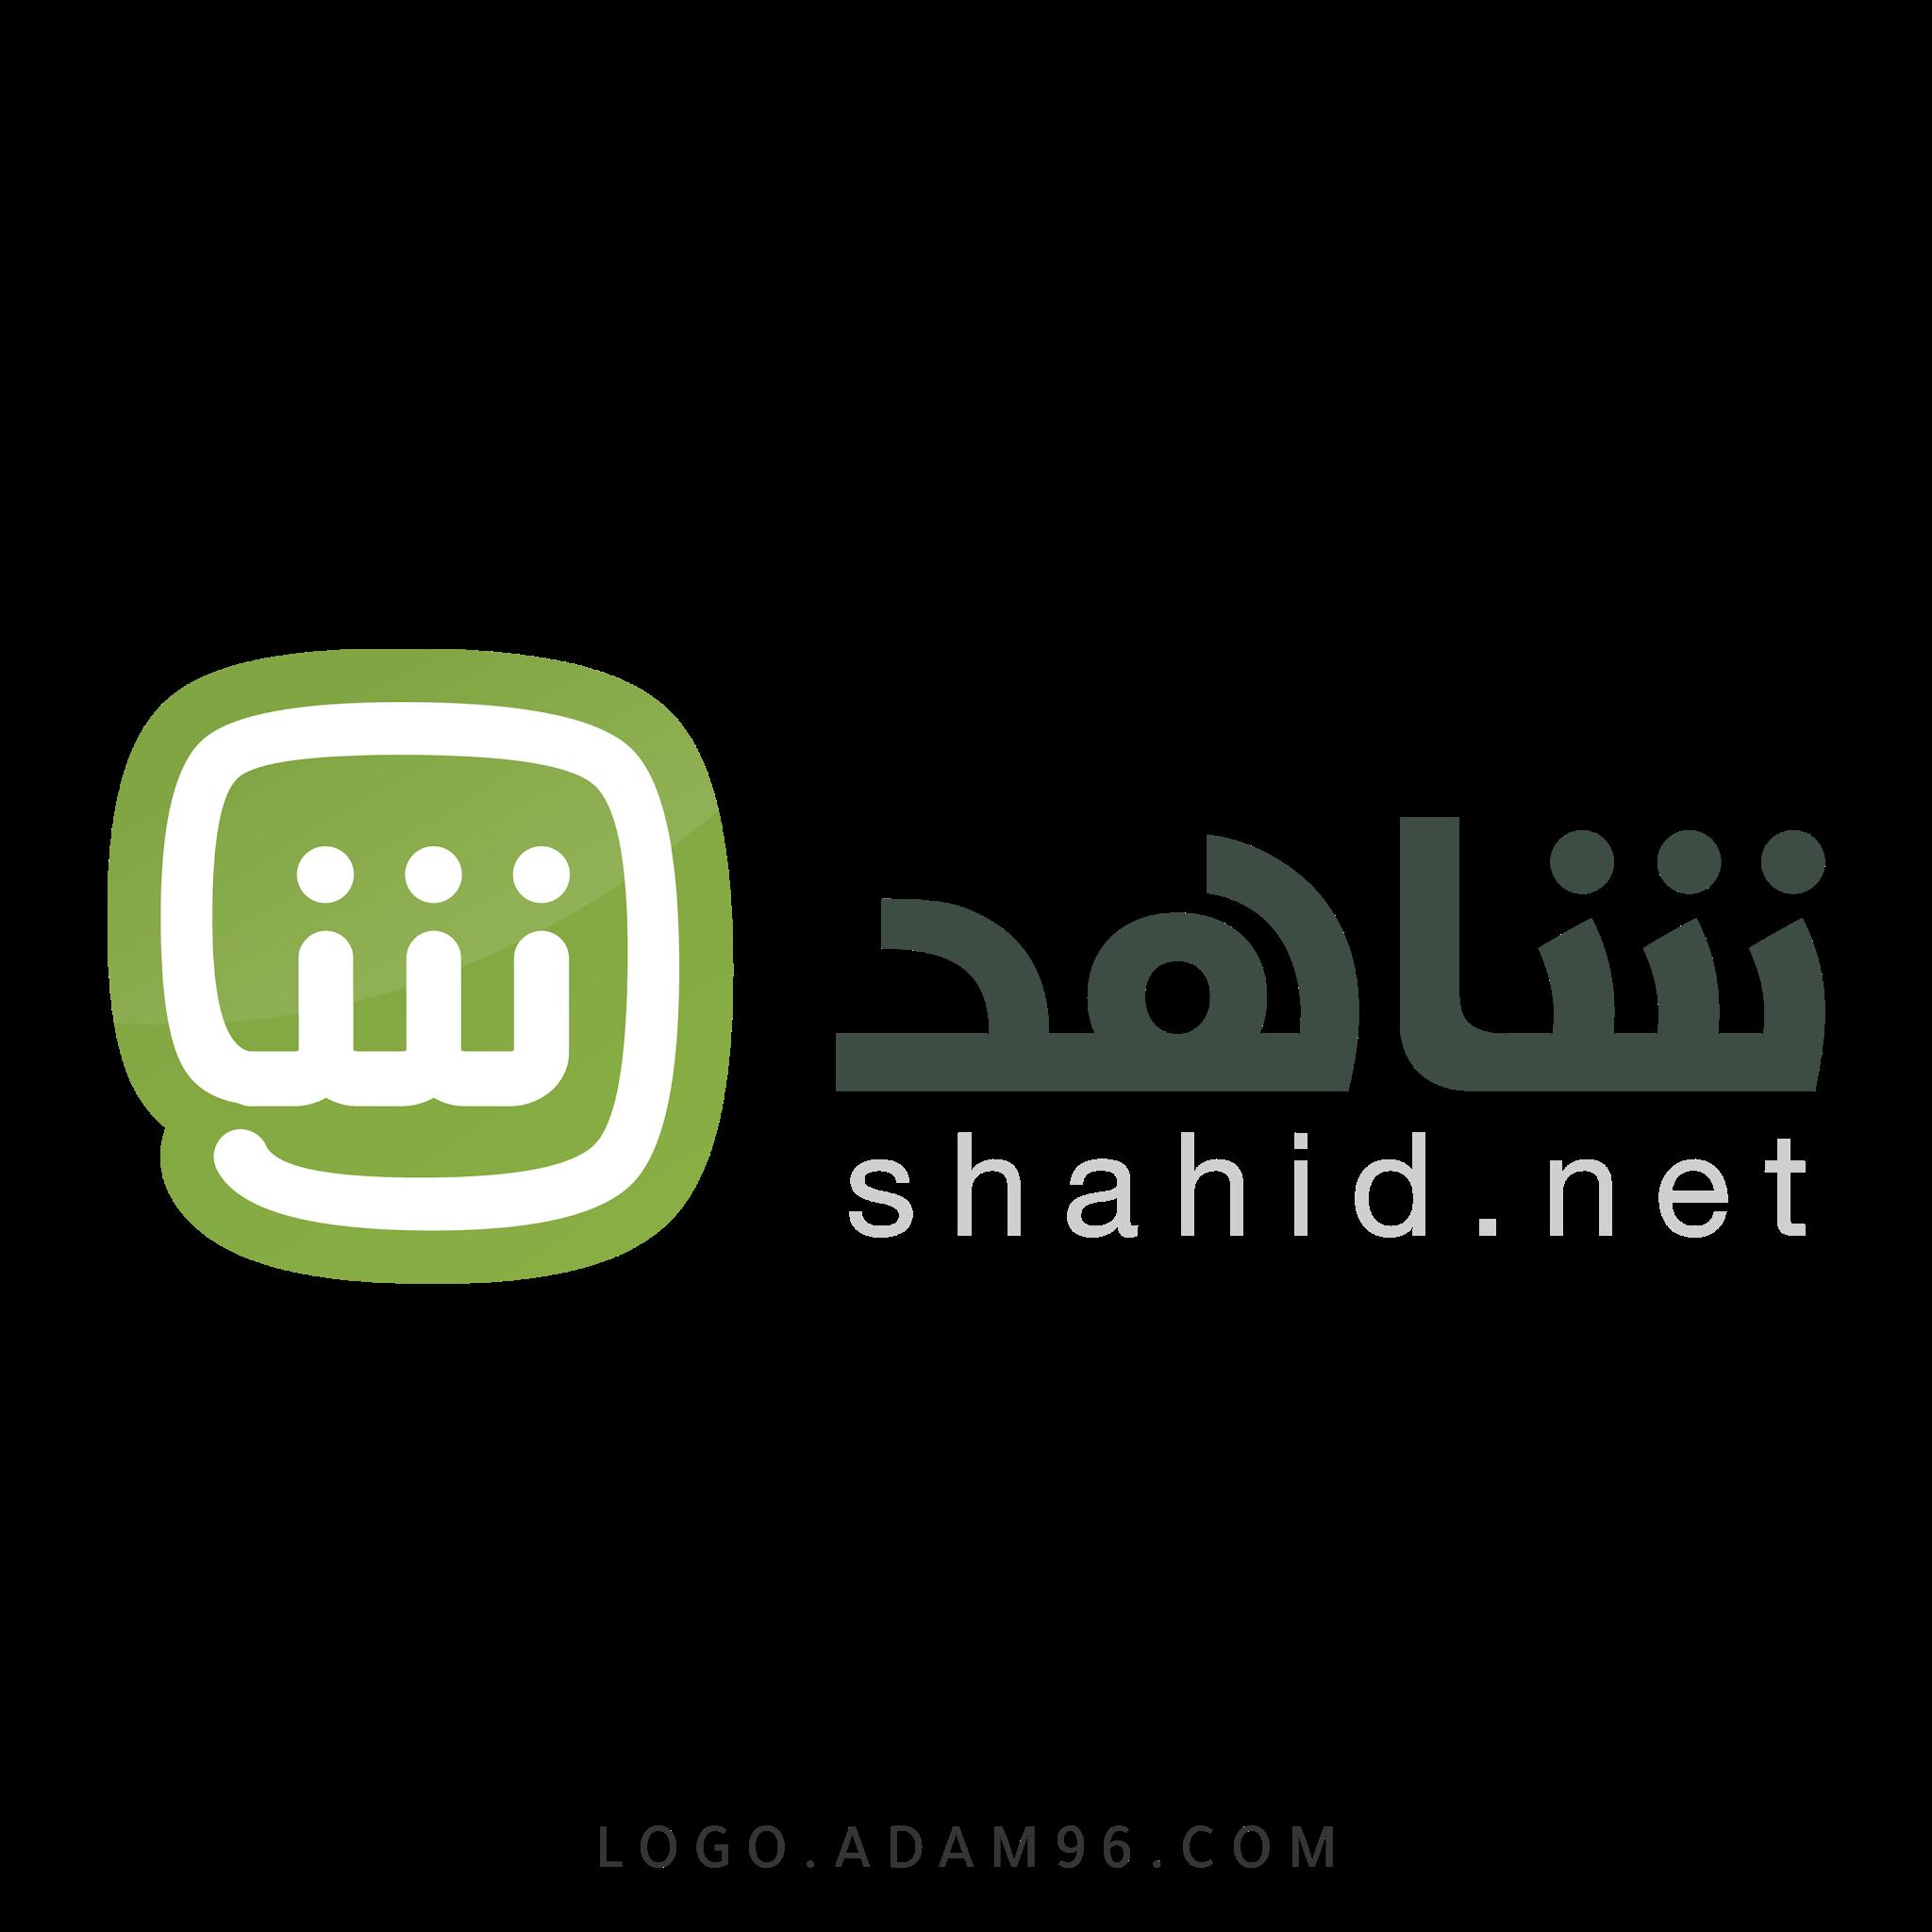 تحميل شعار قناة ام بي سي شاهد لوجو رسمي Logo MBC Shahid